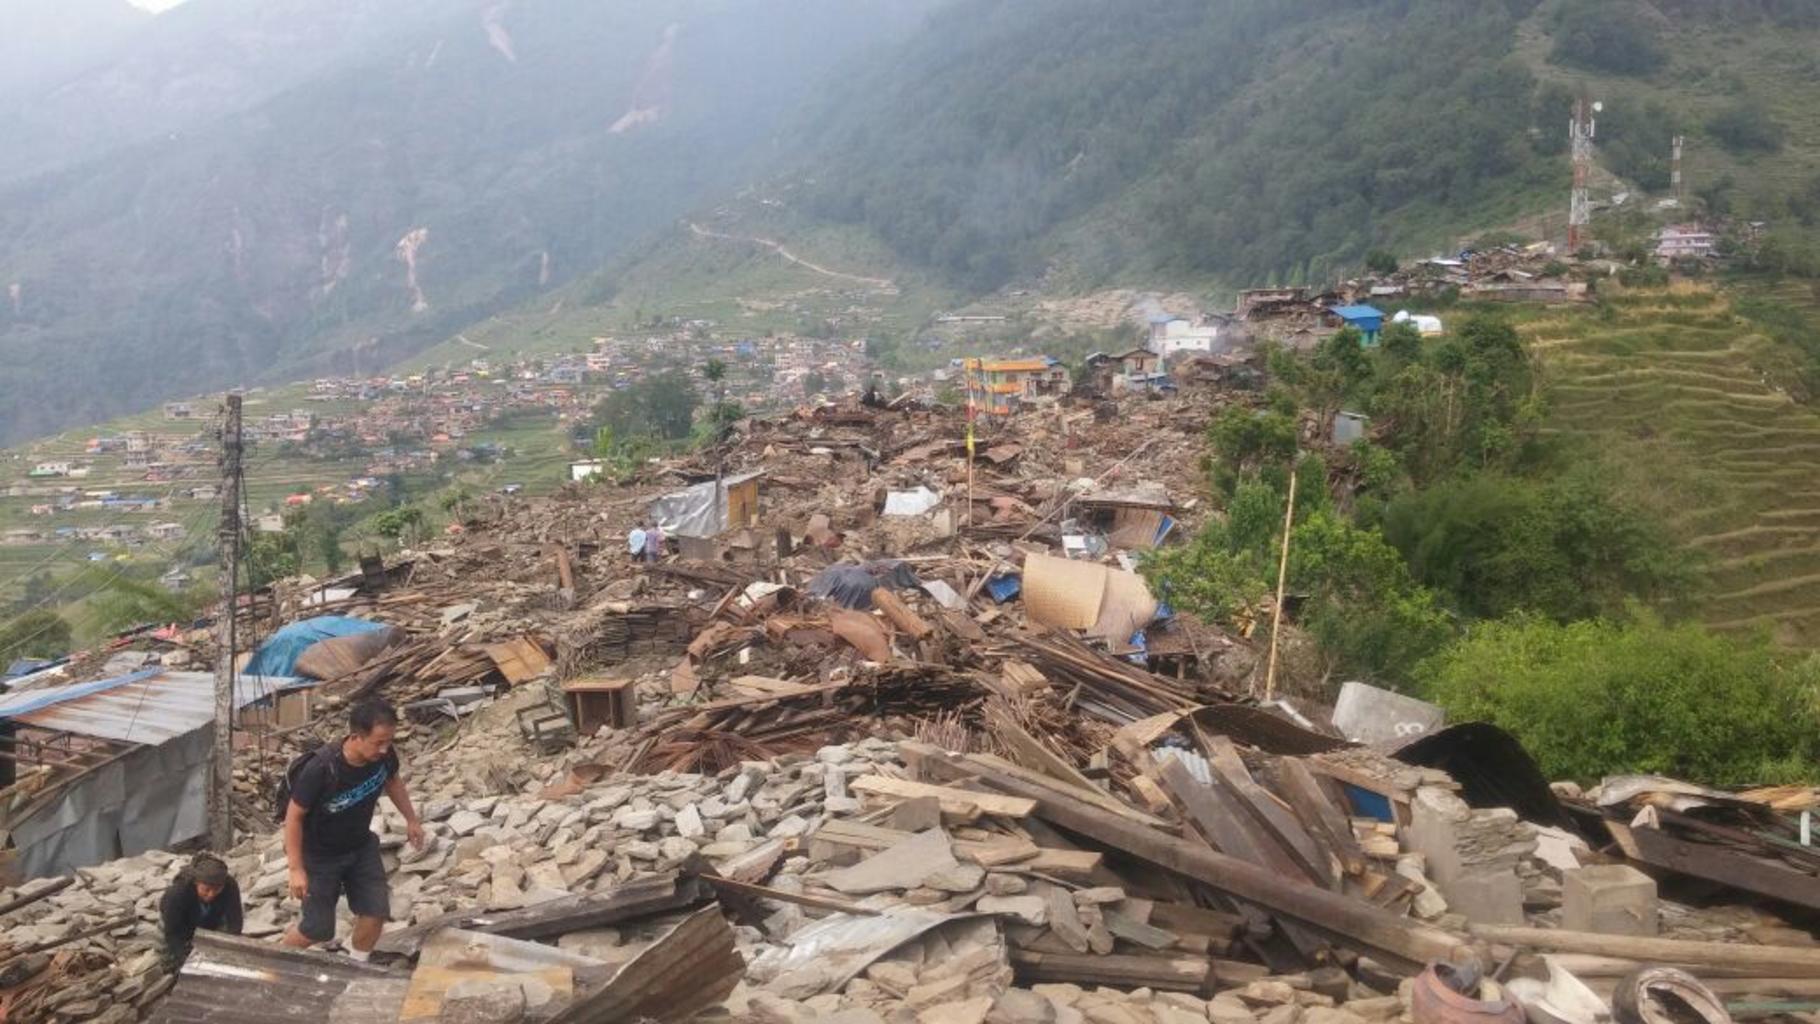 Bild: Zerstörter Ort in Nepal. © Oxfam